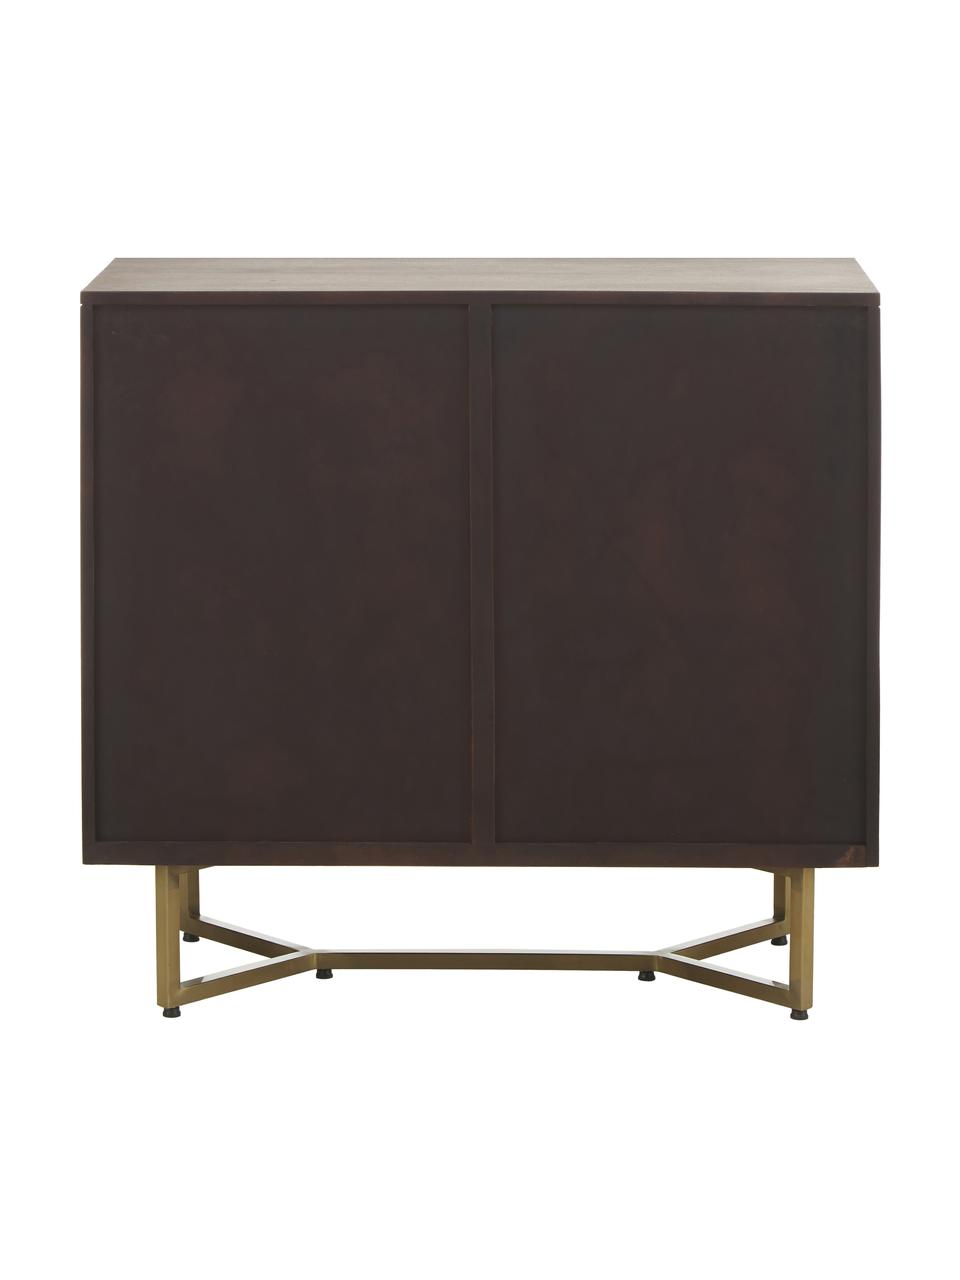 Sideboard Luca aus Massivholz mit Fischgrät-Muster, Korpus: Massives Mangoholz, lacki, Füße: Metall, pulverbeschichtet, Braun, 90 x 83 cm